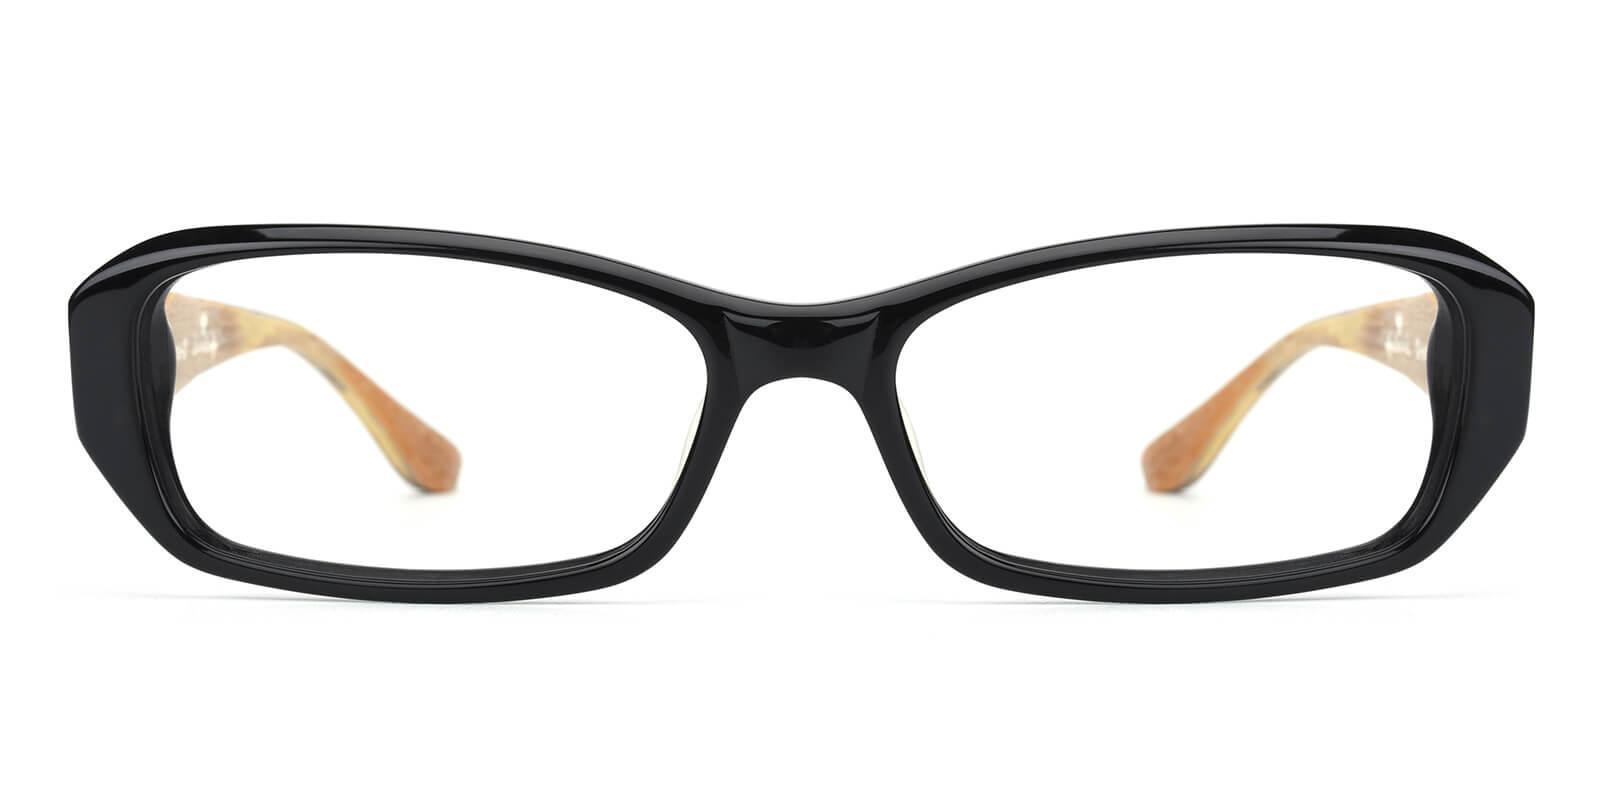 Robion-Black-Rectangle-Acetate-Eyeglasses-additional2